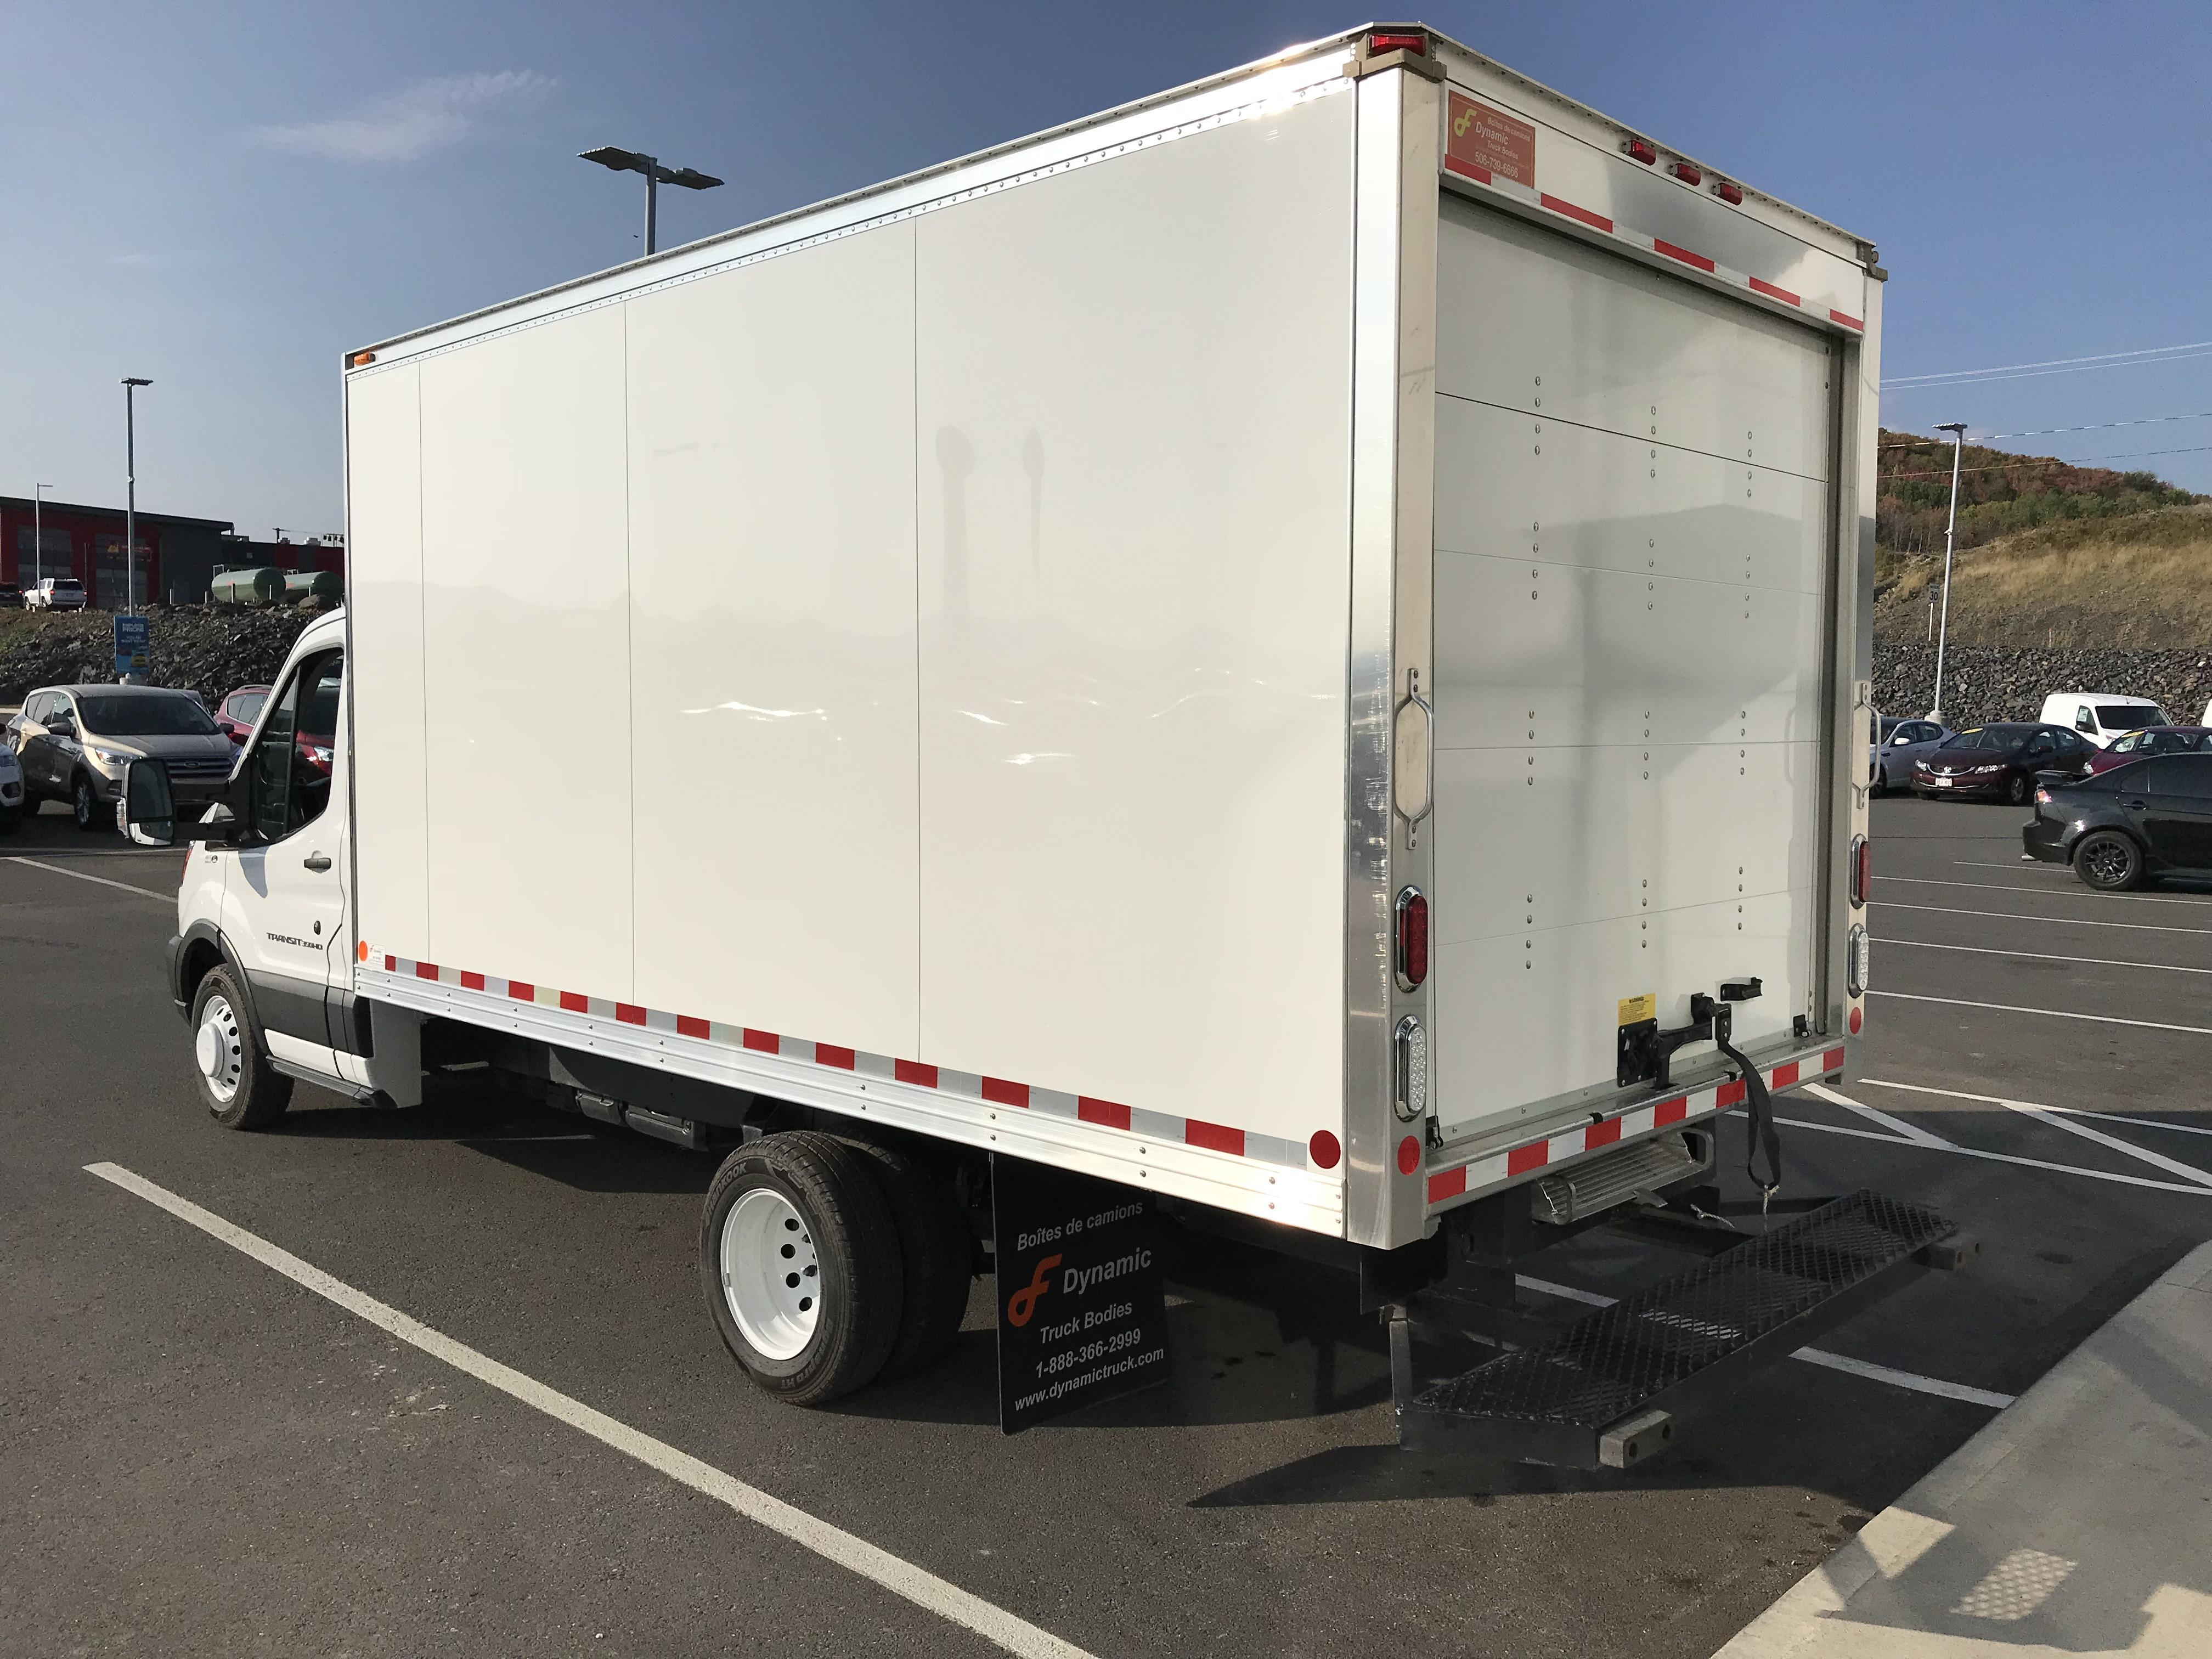 2017 Transit 350 HD Chassis Cab XL